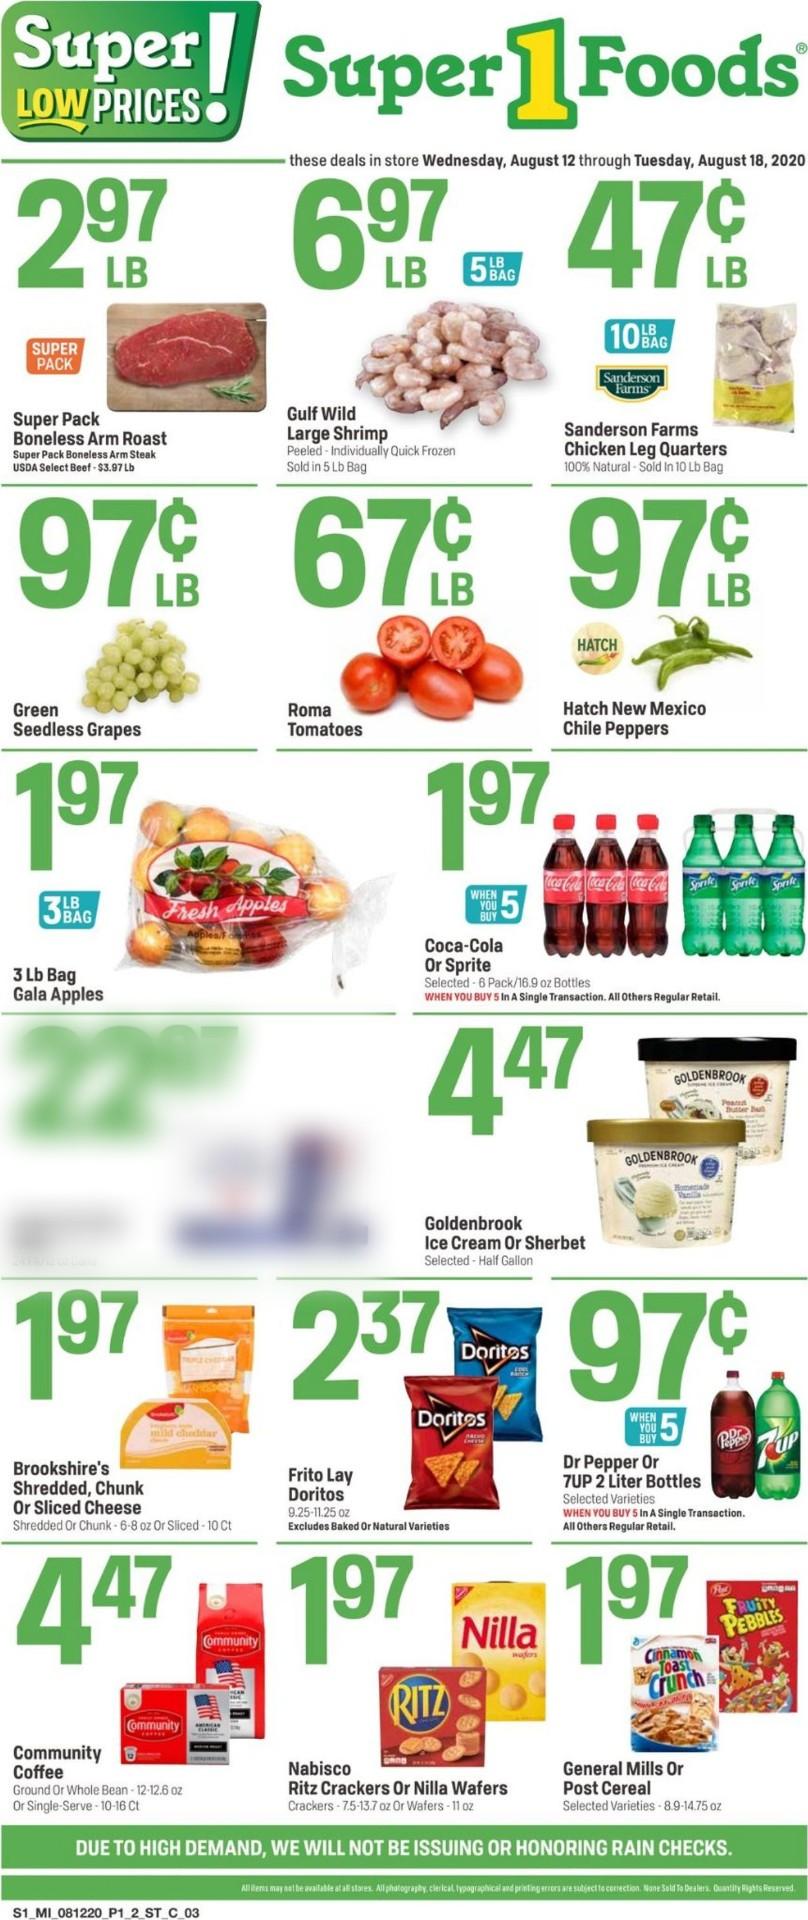 Super 1 Foods Weekly Ad Circular - valid 08/12-08/18/2020